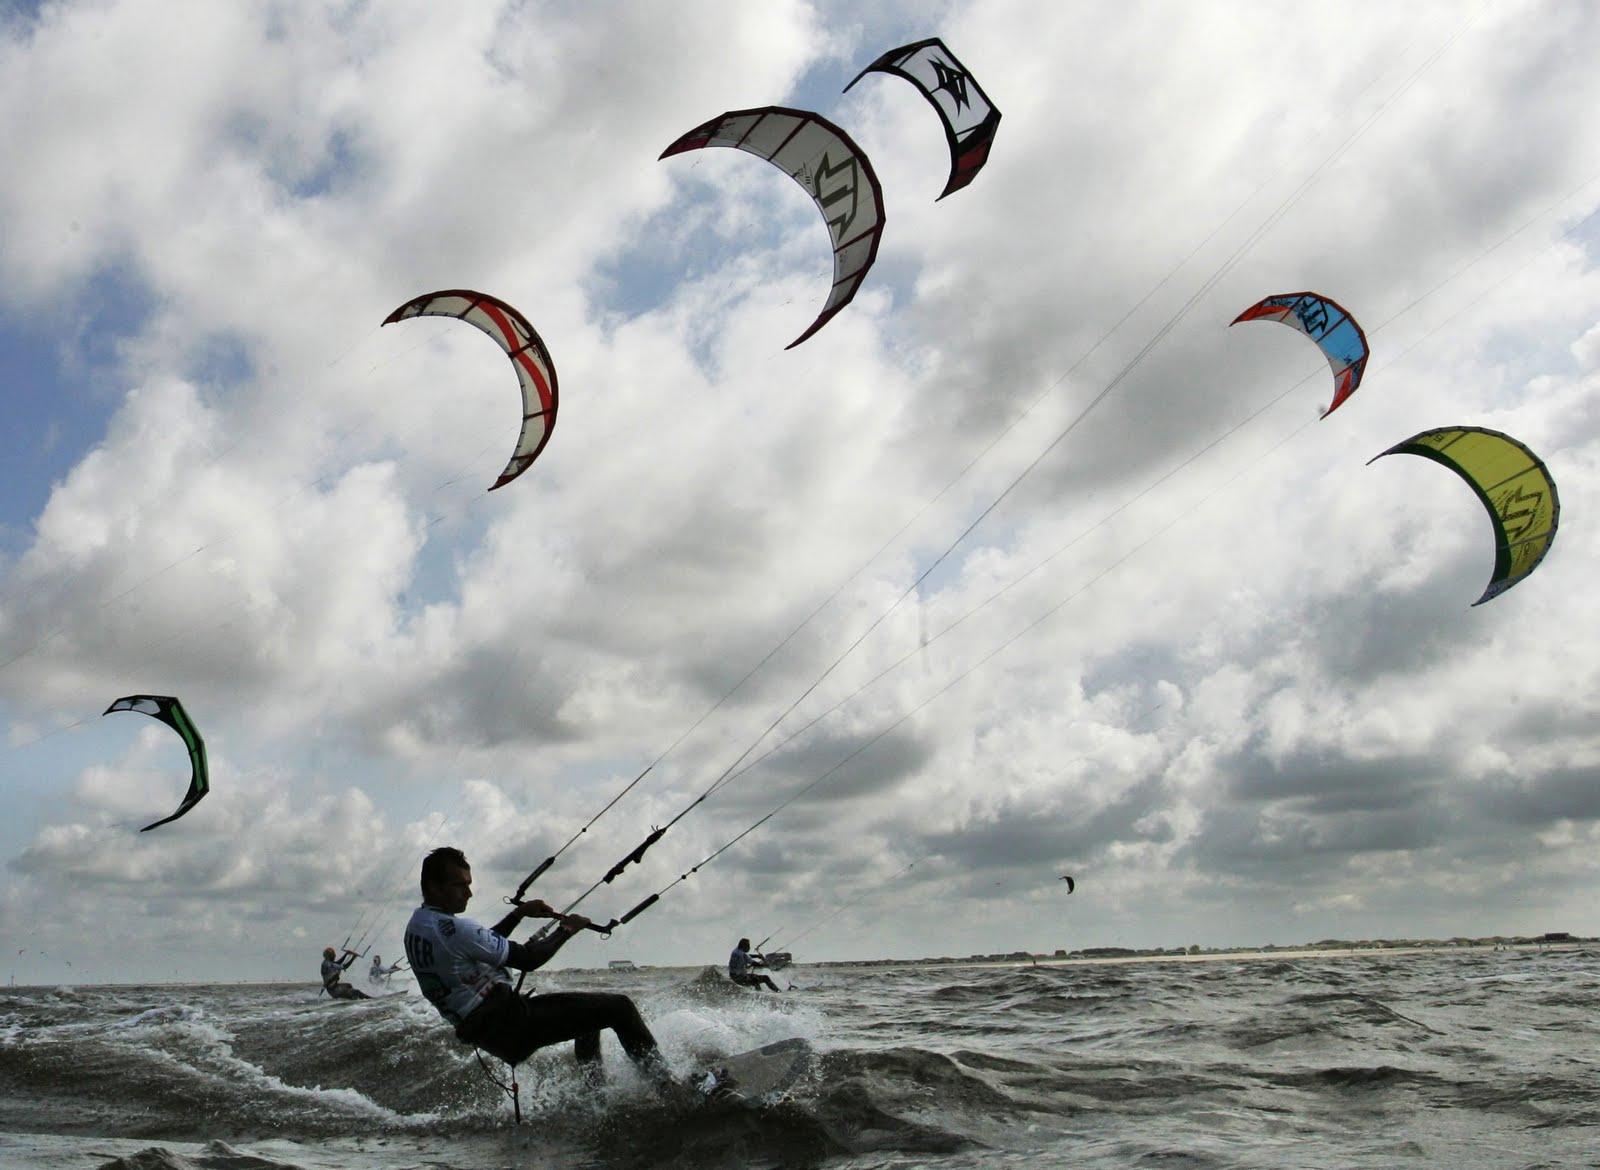 KiteSurfer1-kopie-2